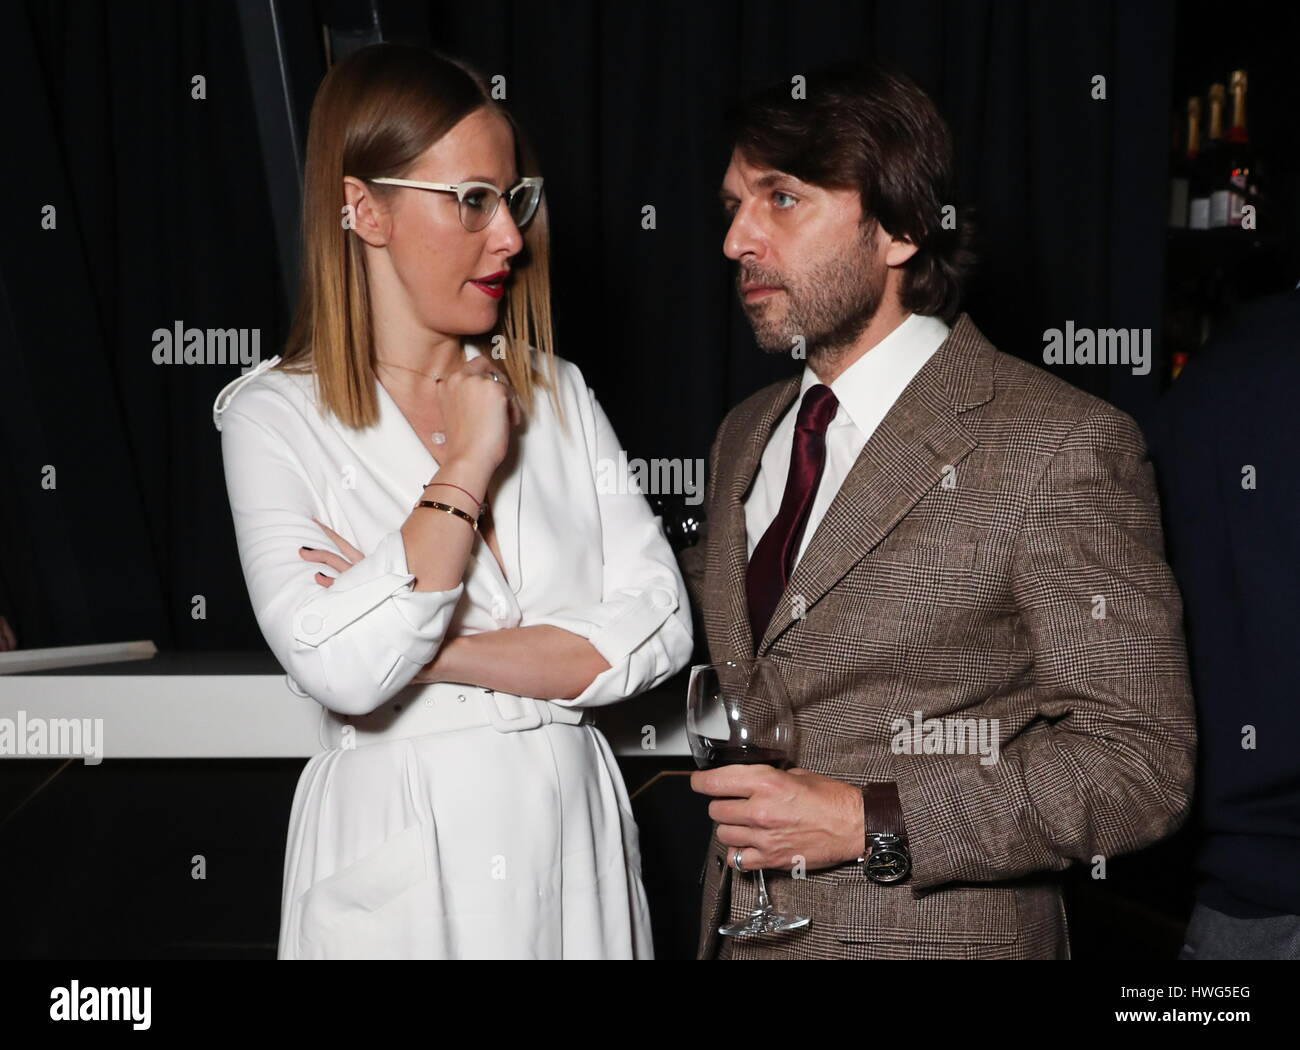 Ksenia Sobchak and Sergey Kapkov split up 05/18/2011 21